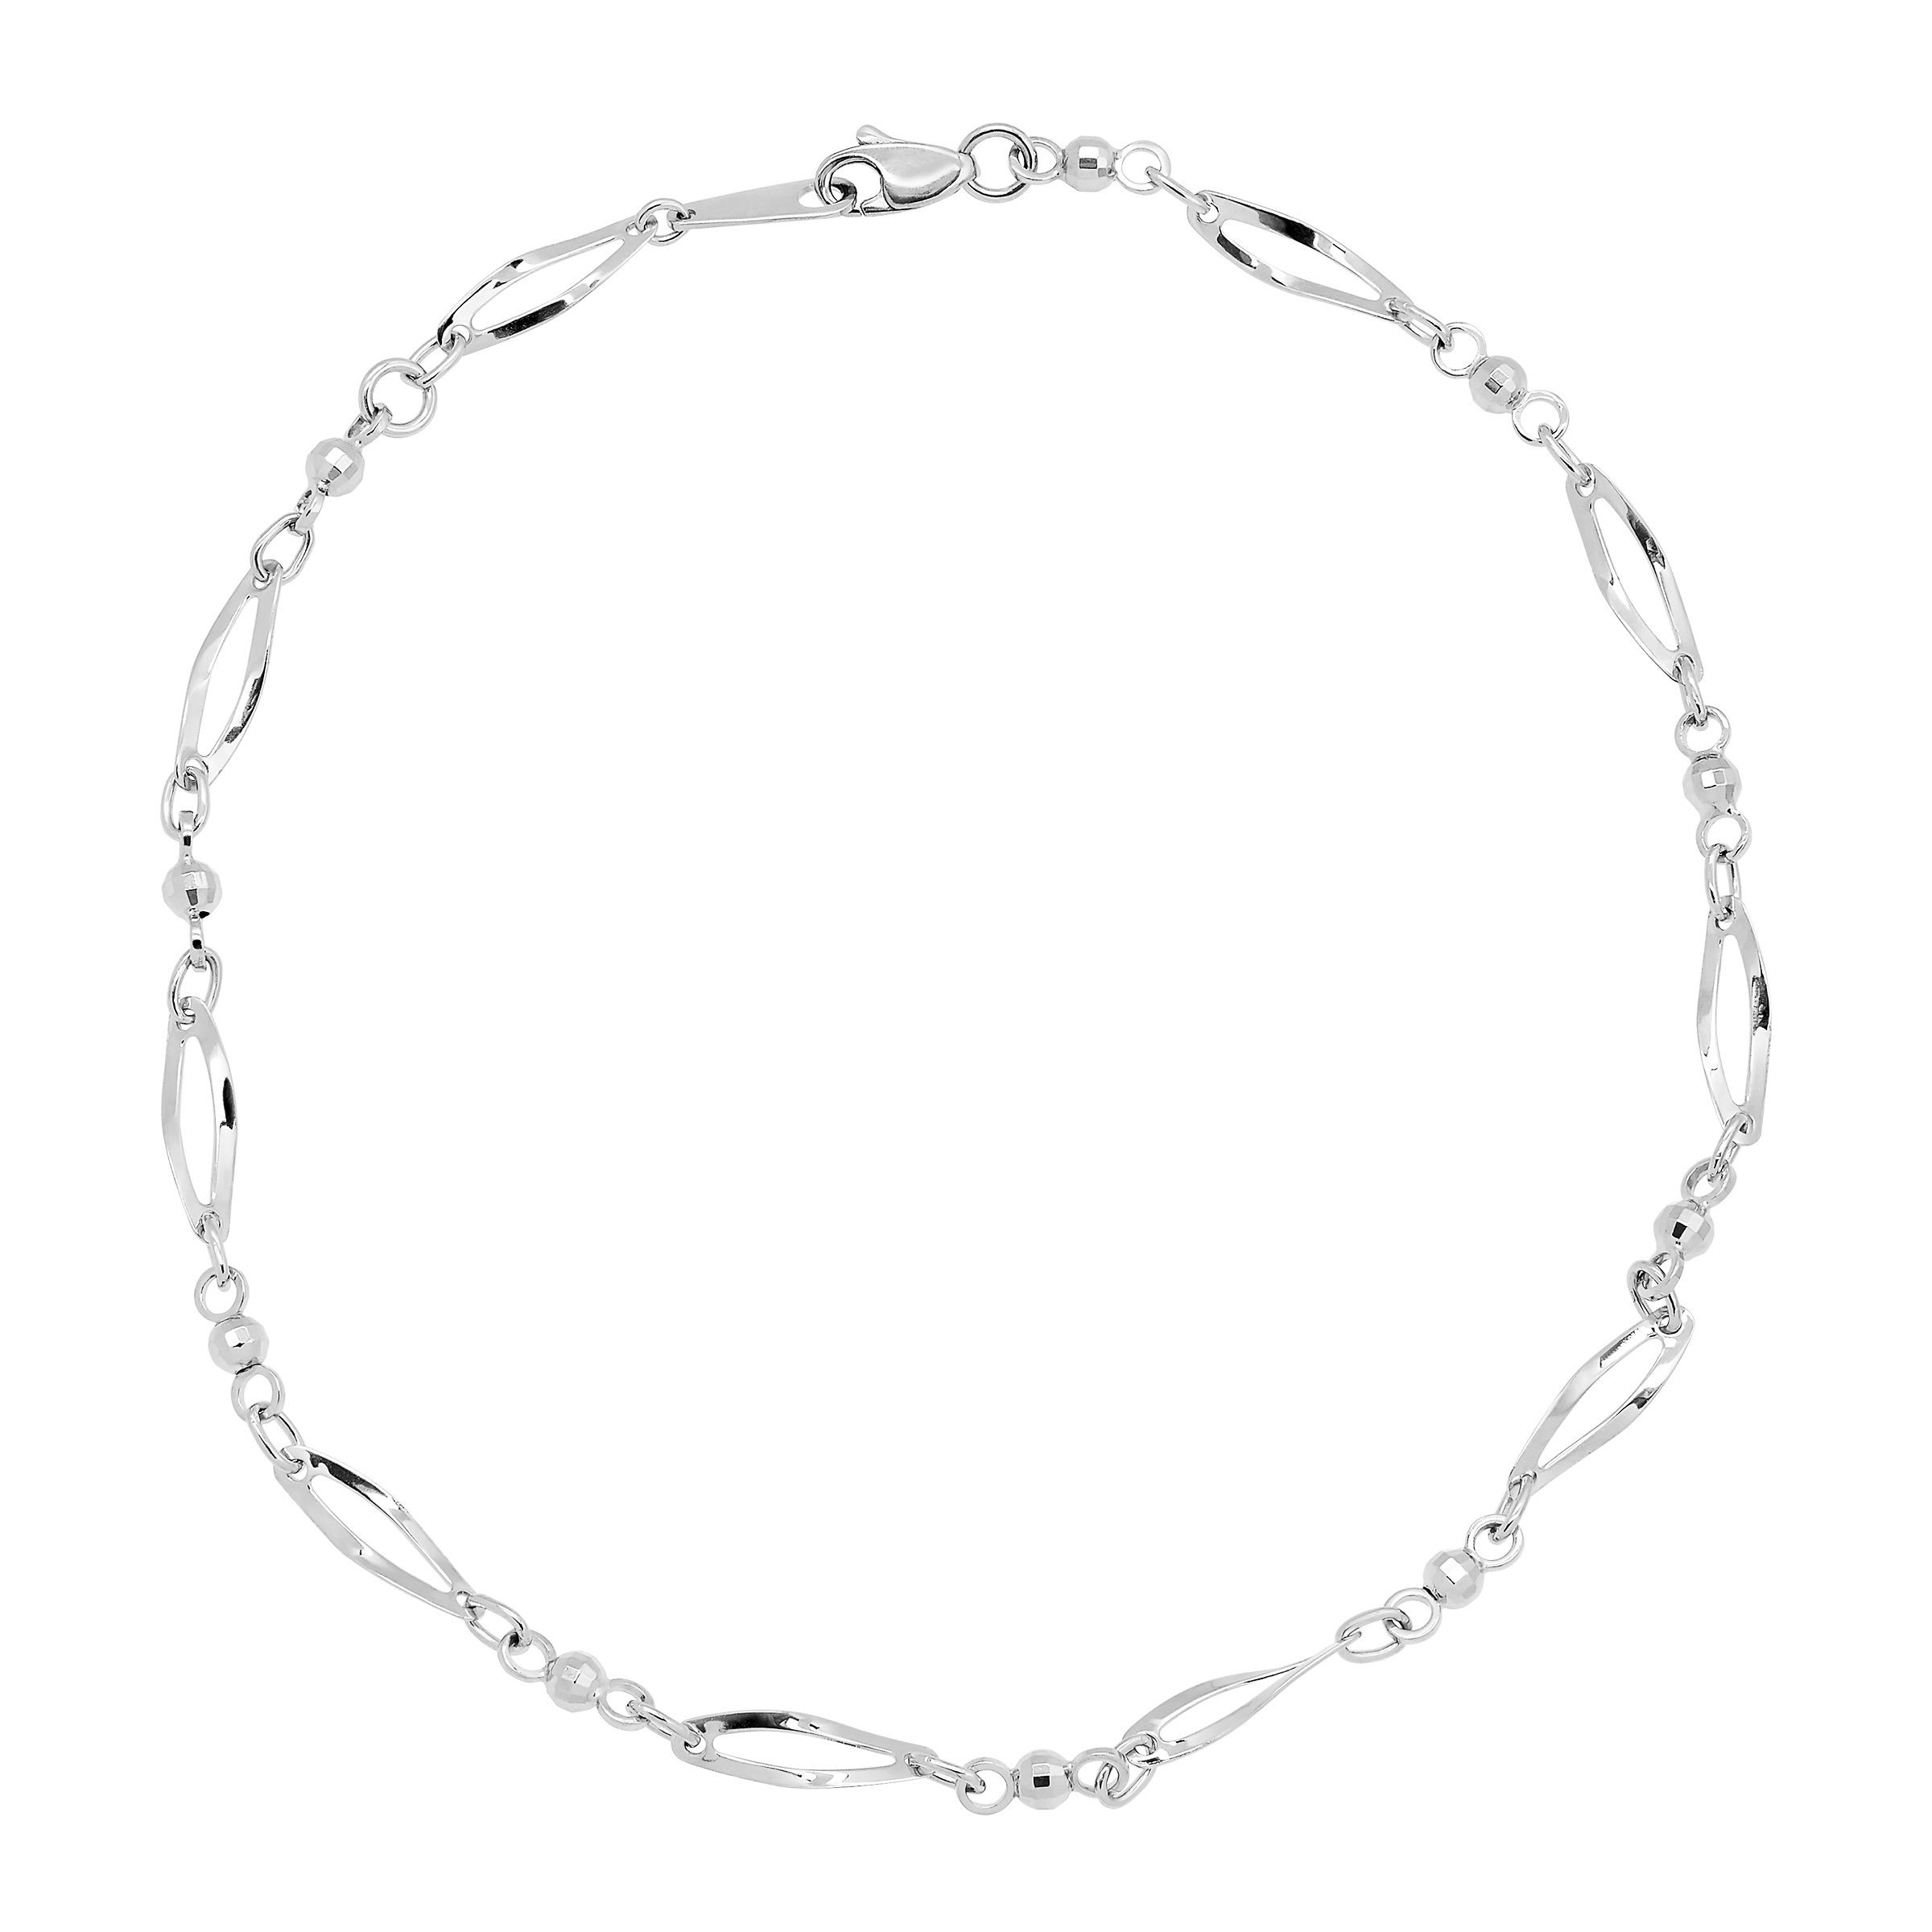 Just Gold Oval & Beaded Link Anklet Bracelet in 10K White Gold